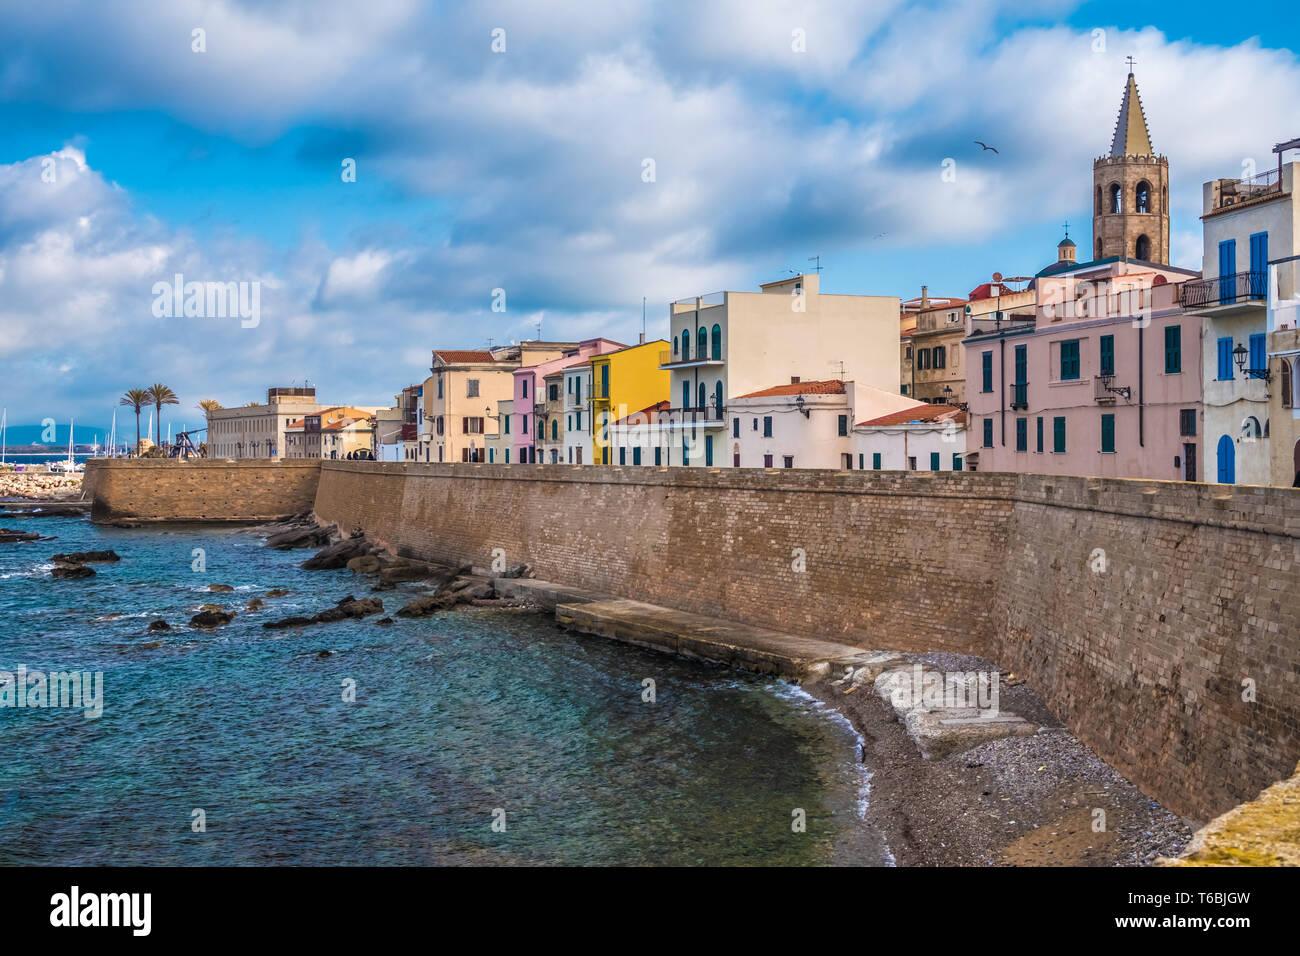 The old town of Alghero (L'Alguer), province of Sassari , northwestern Sardinia, Italy. - Stock Image